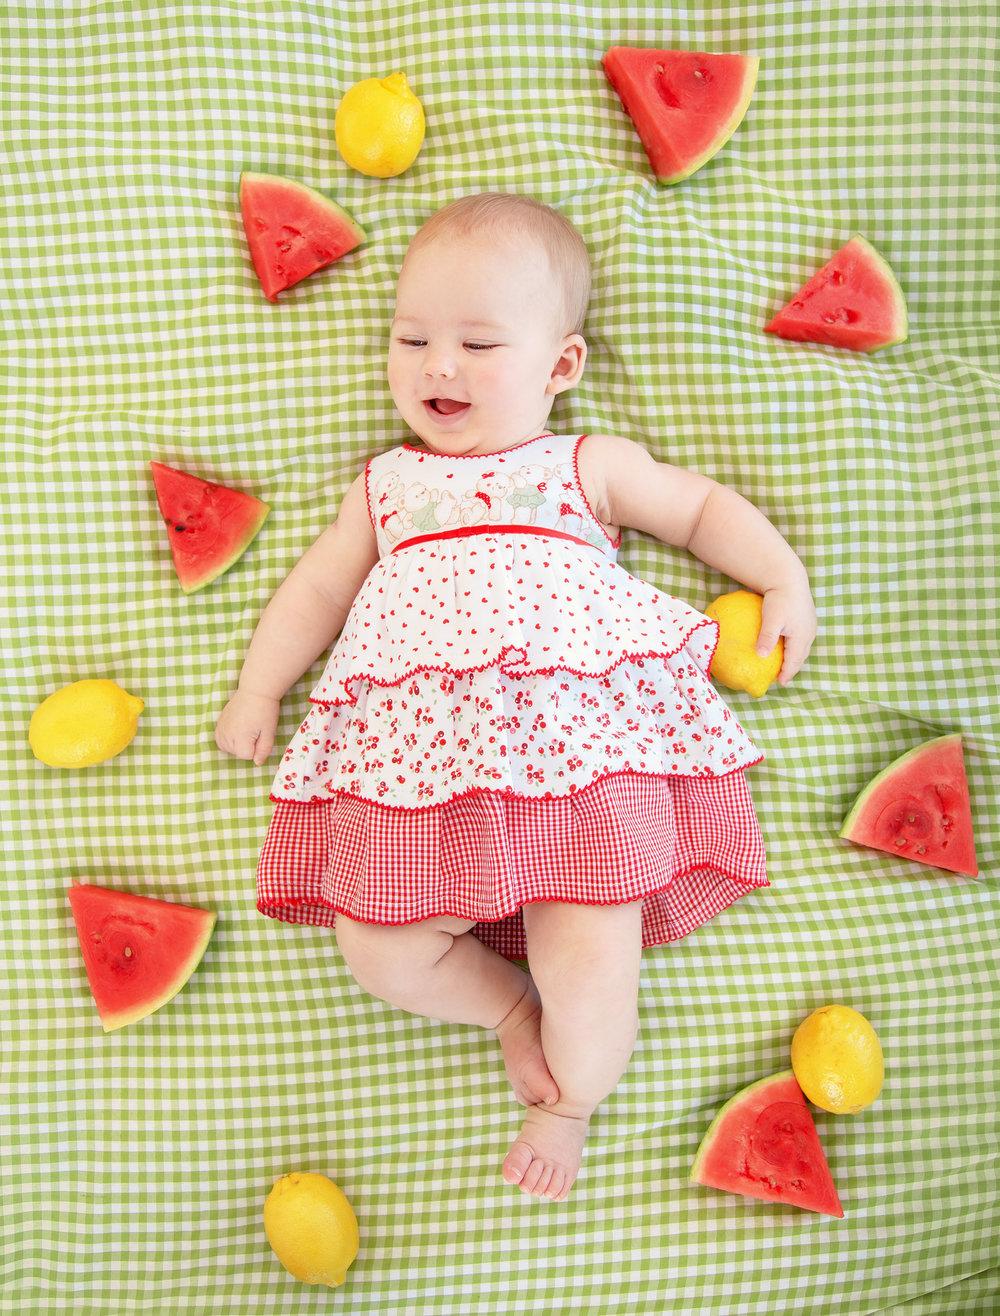 midivertounmondo_lemon and watermelon .jpg